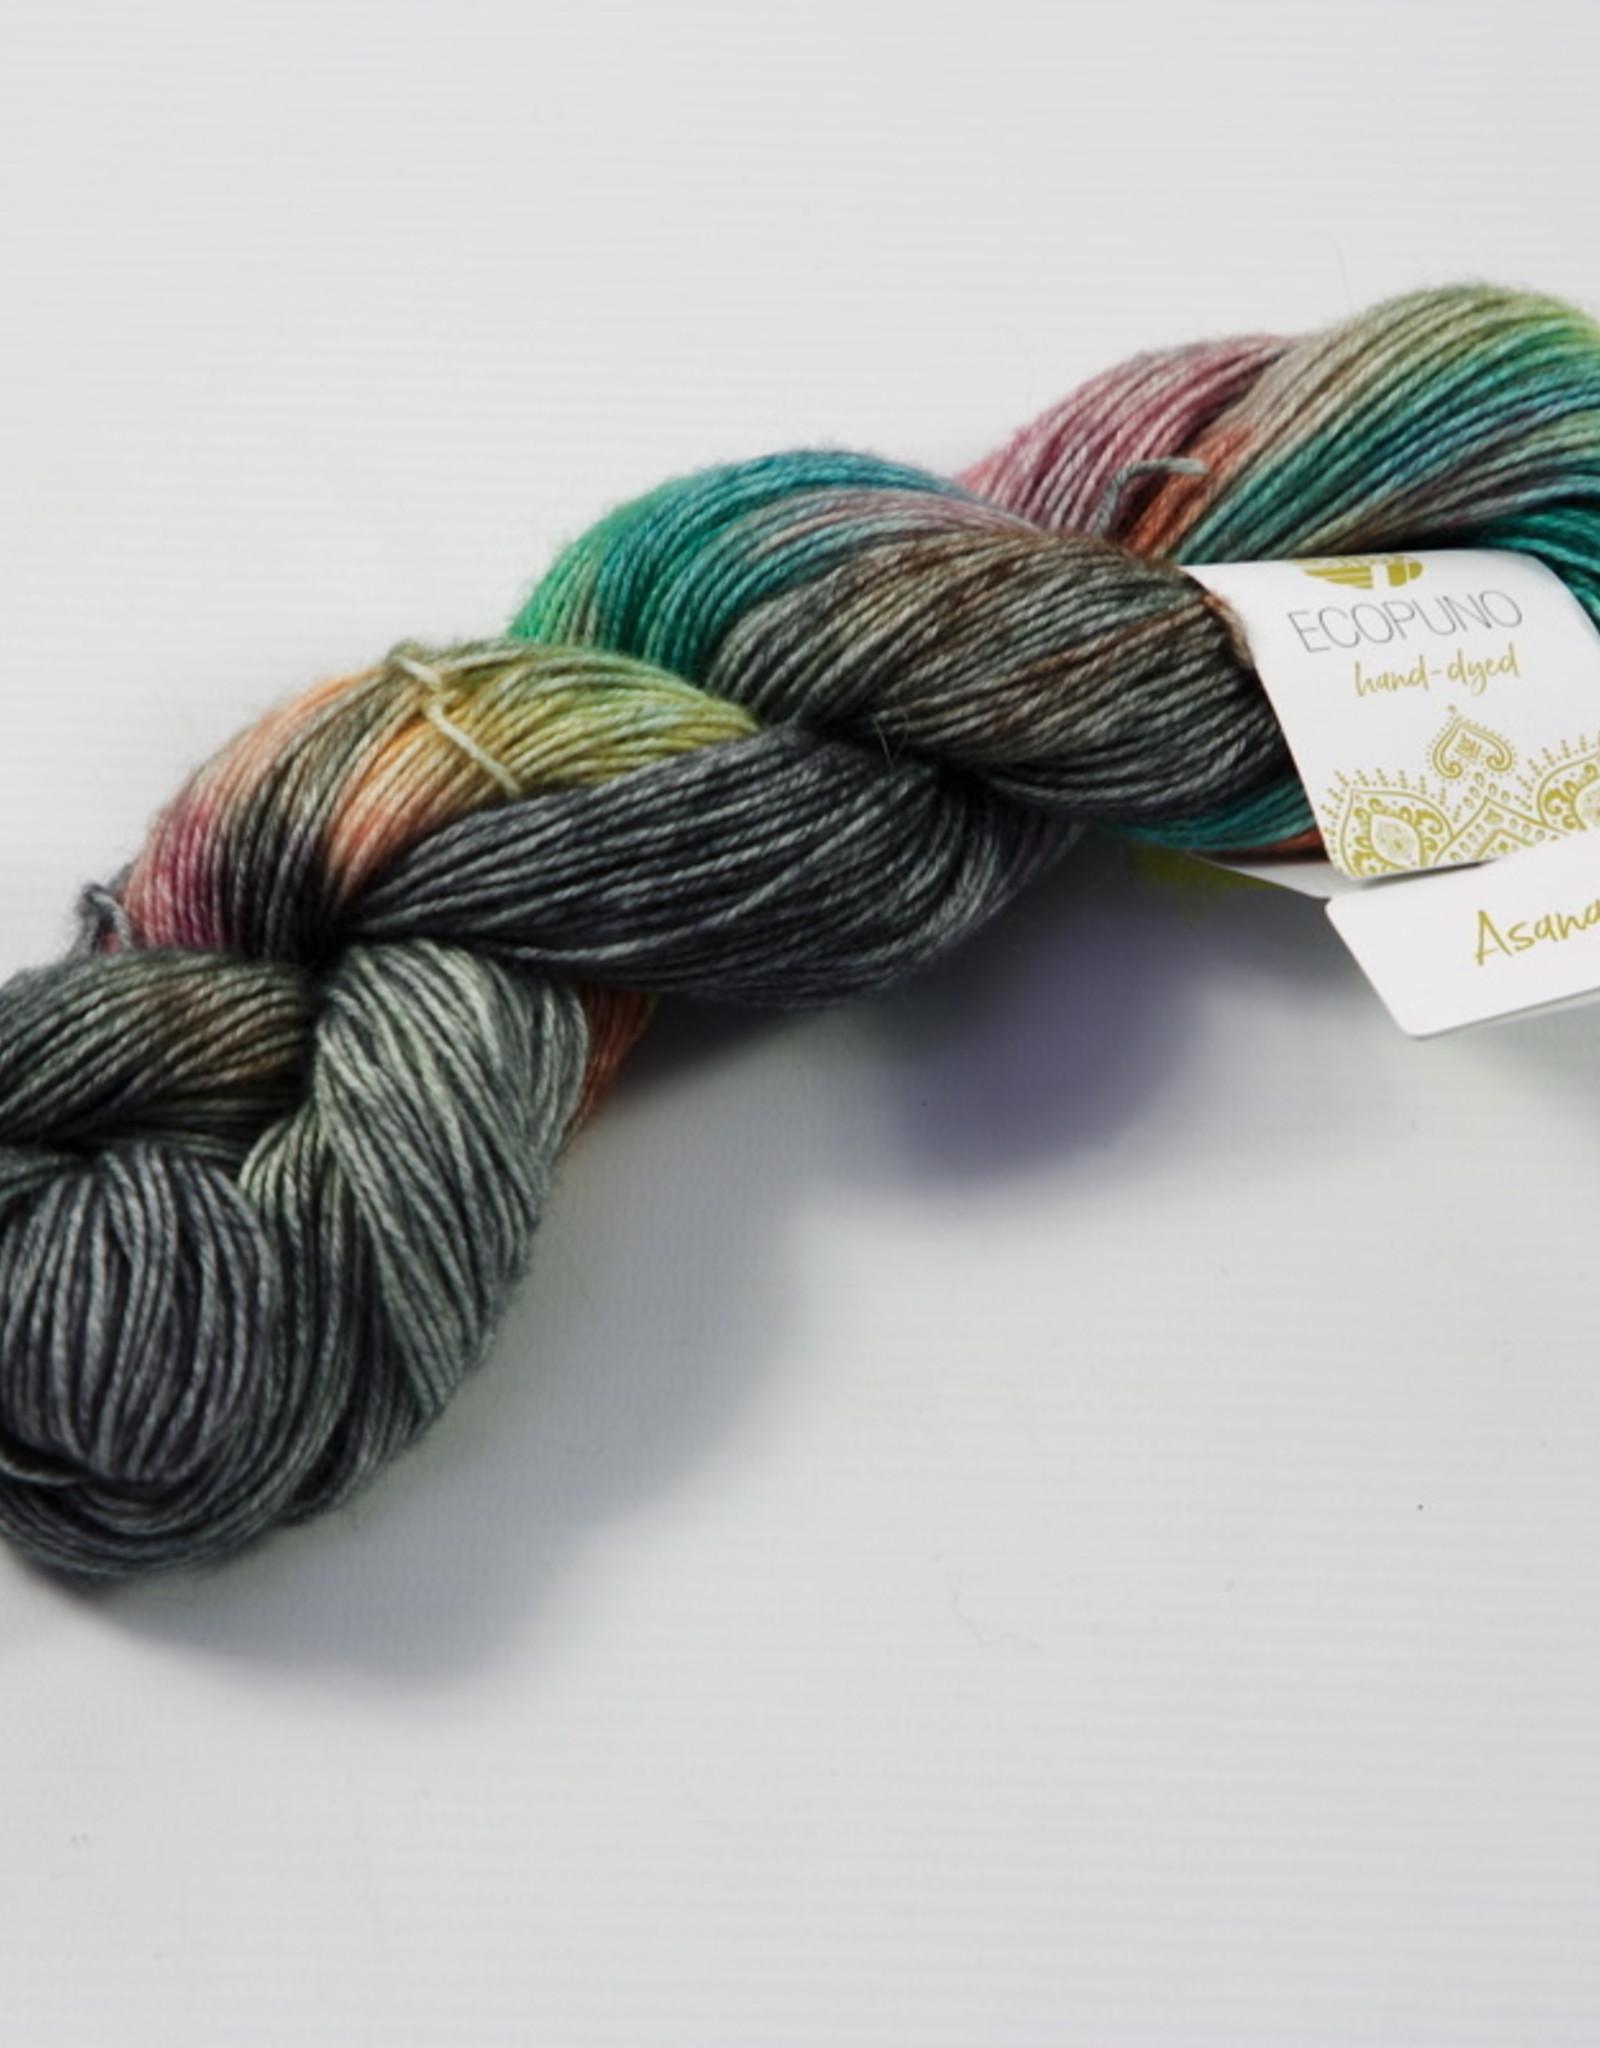 Lana Grossa Ecopuno Hand-Dyed 505